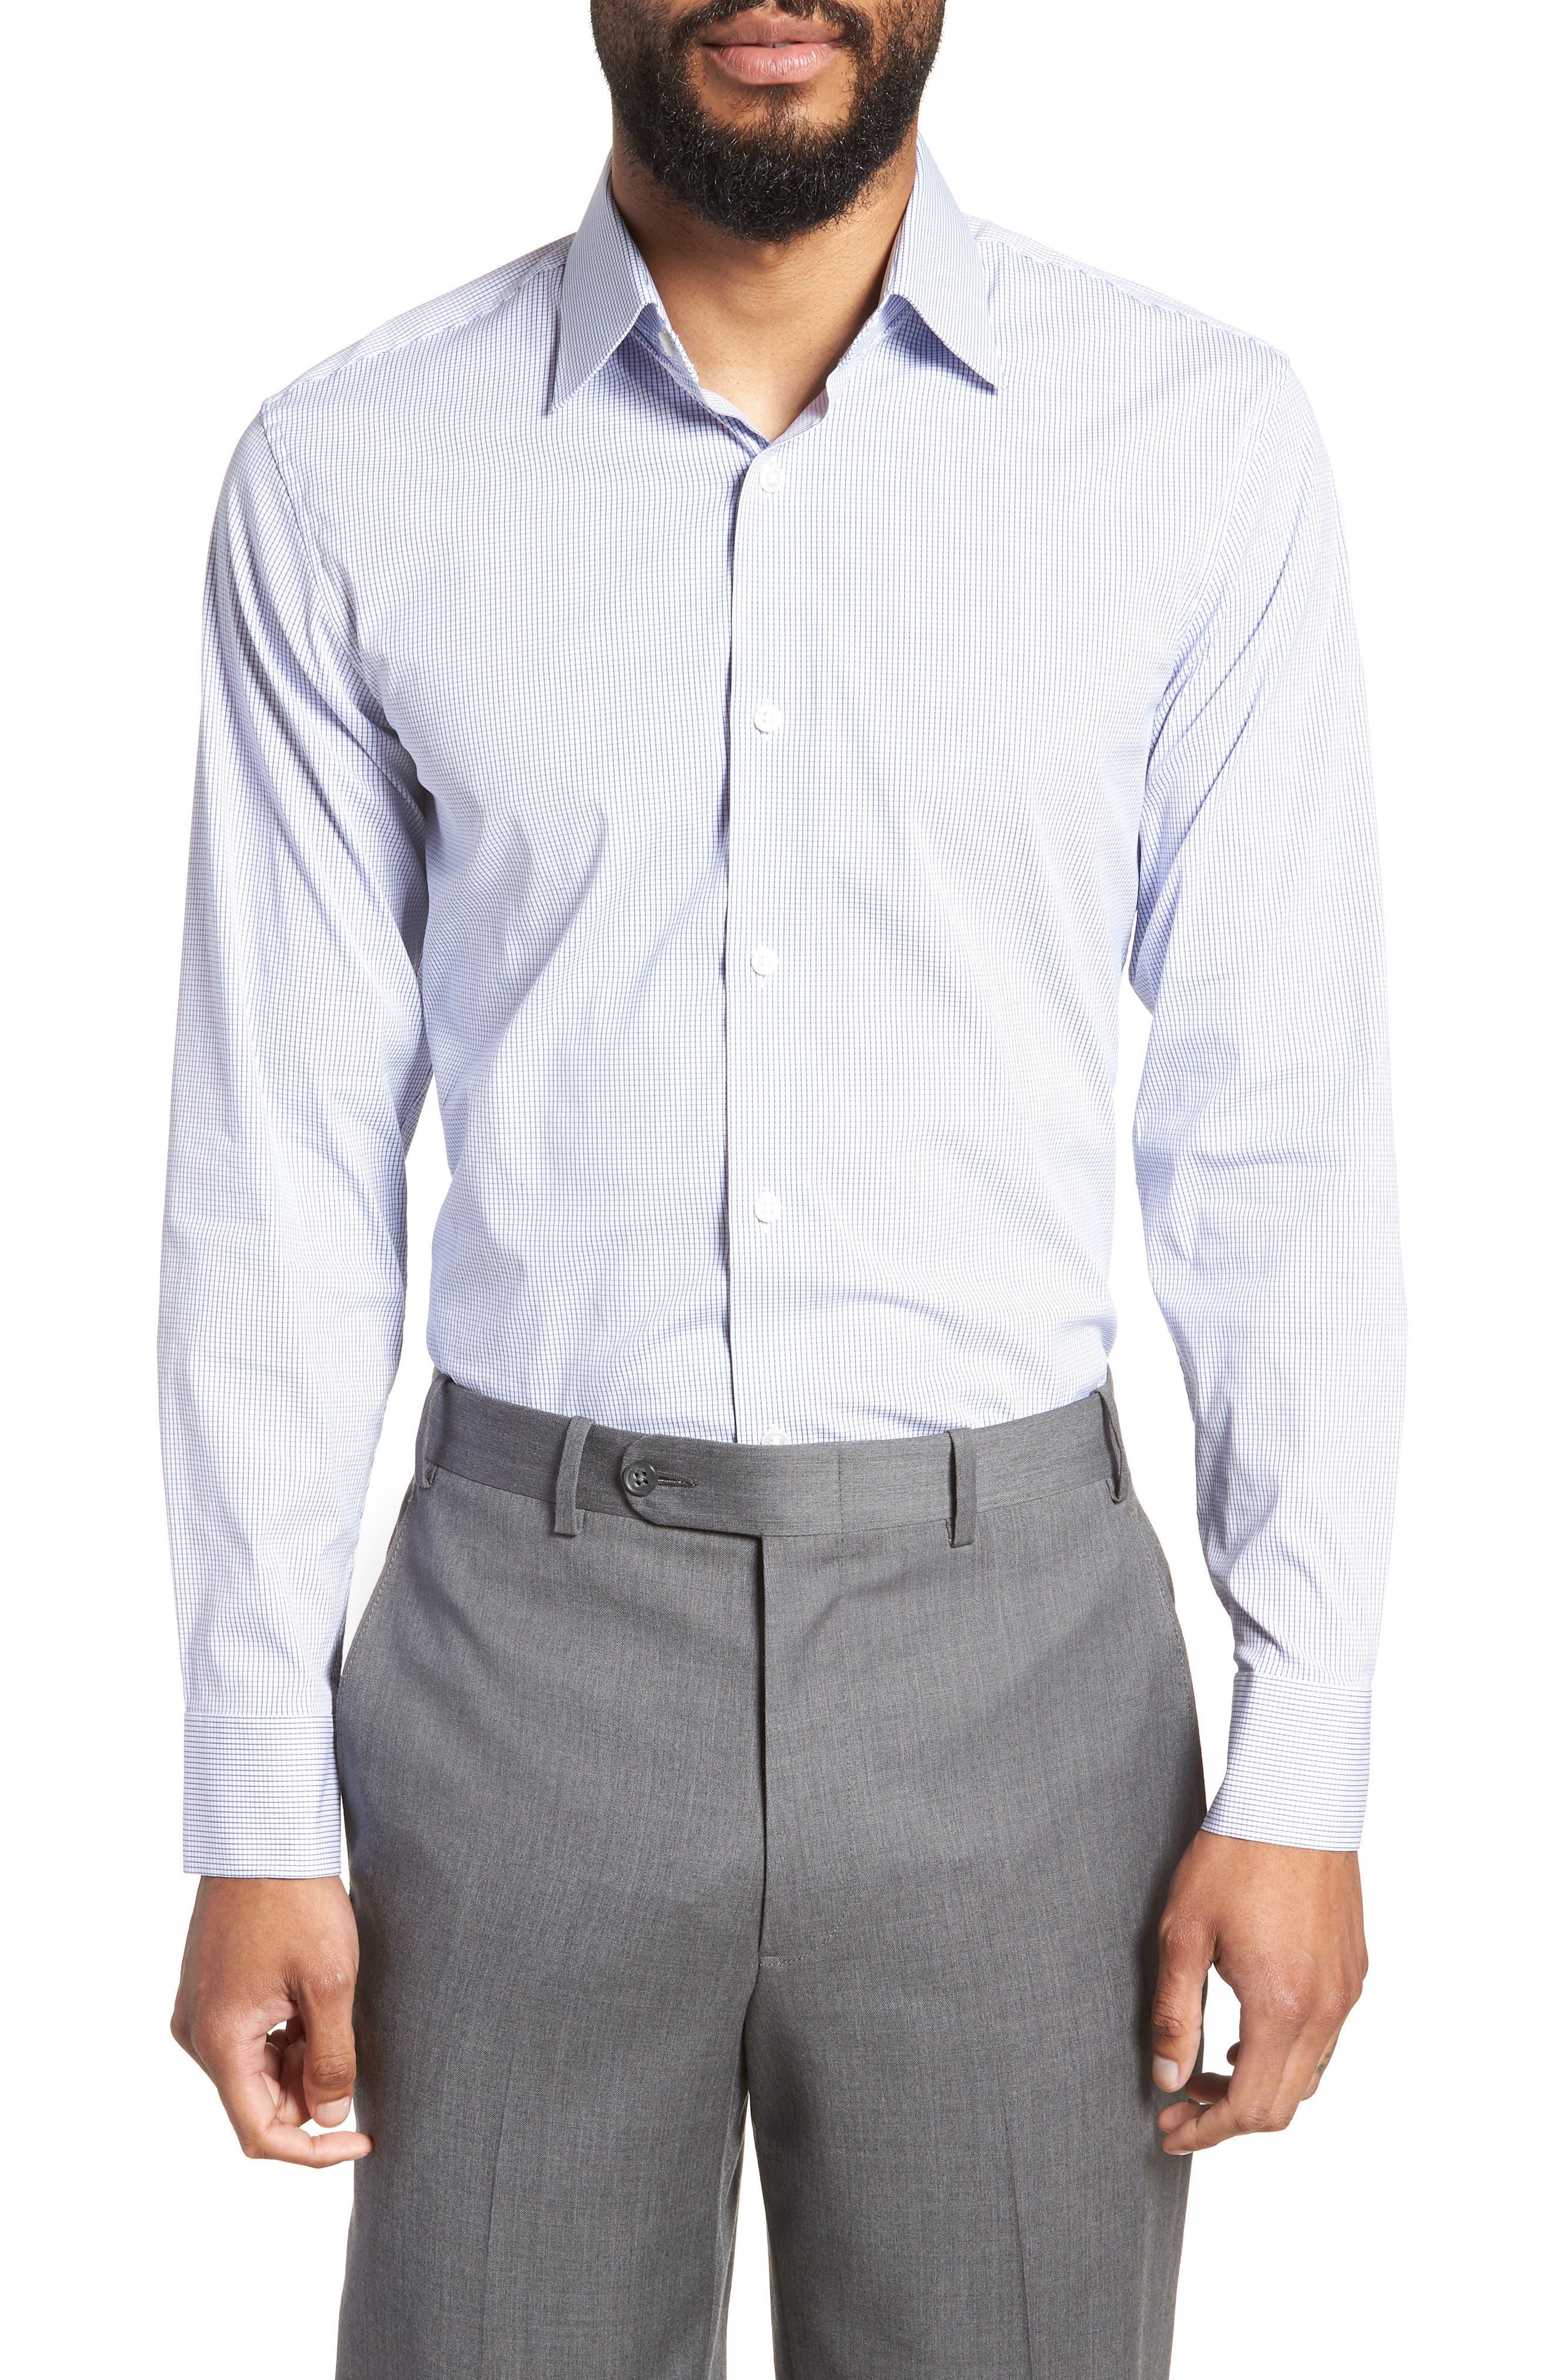 Jetsetter Slim Fit Stretch Check Dress Shirt,                             Main thumbnail 1, color,                             NAVY MINI CHECK